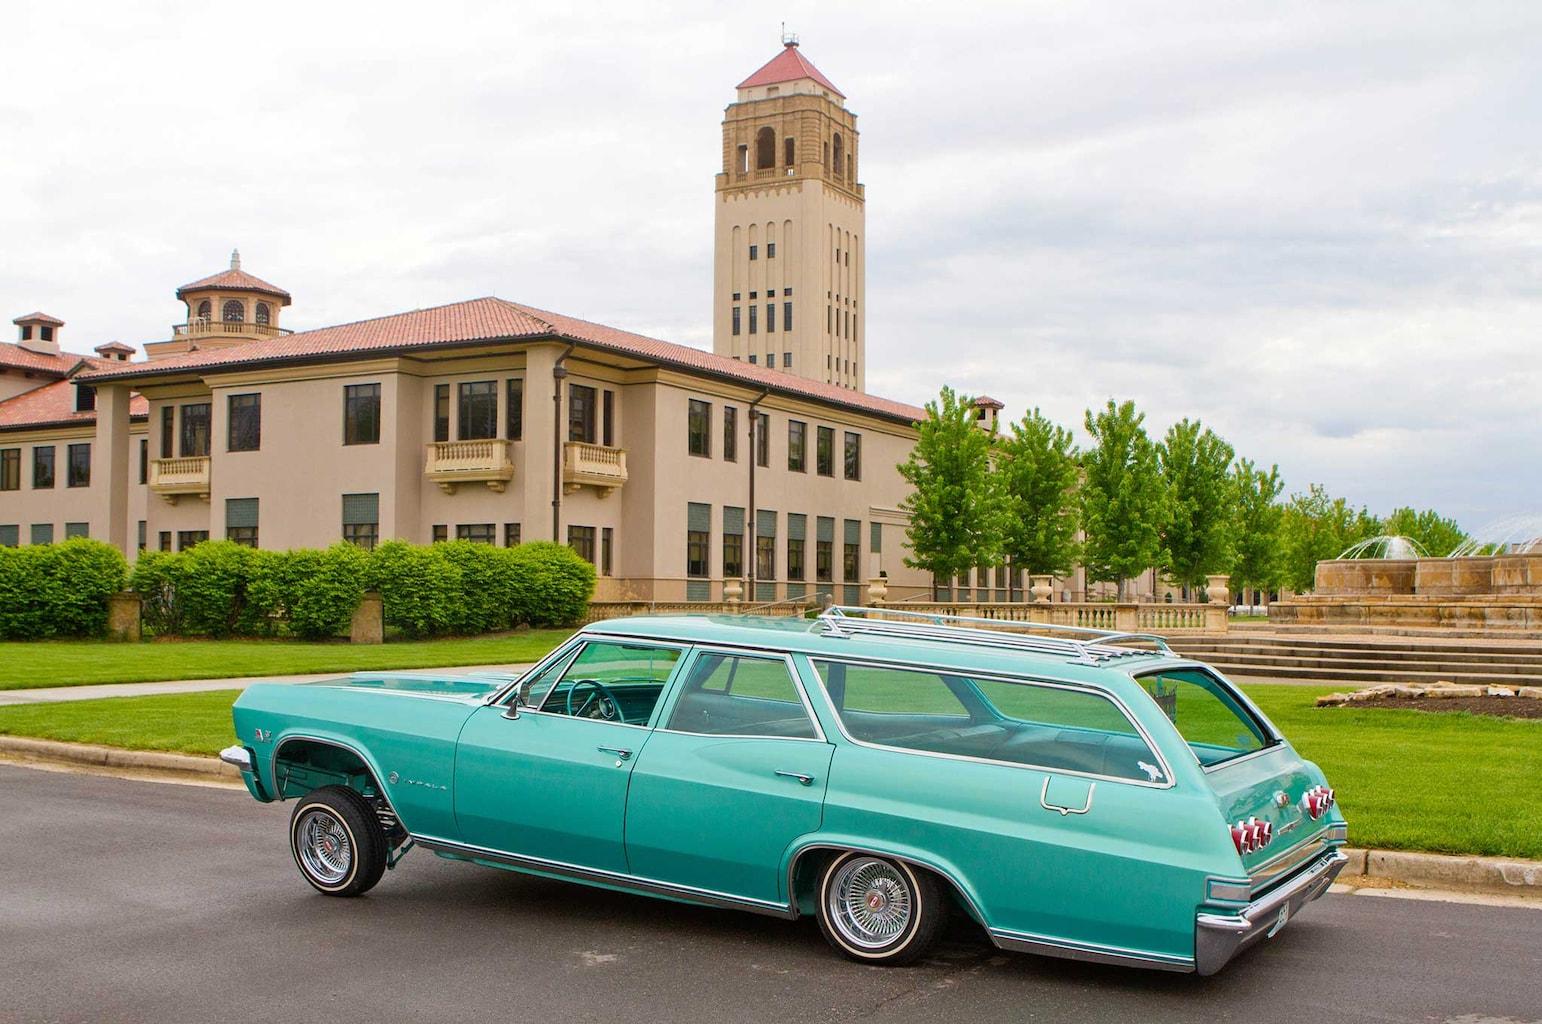 1965 chevrolet impala wagon driver side view 009